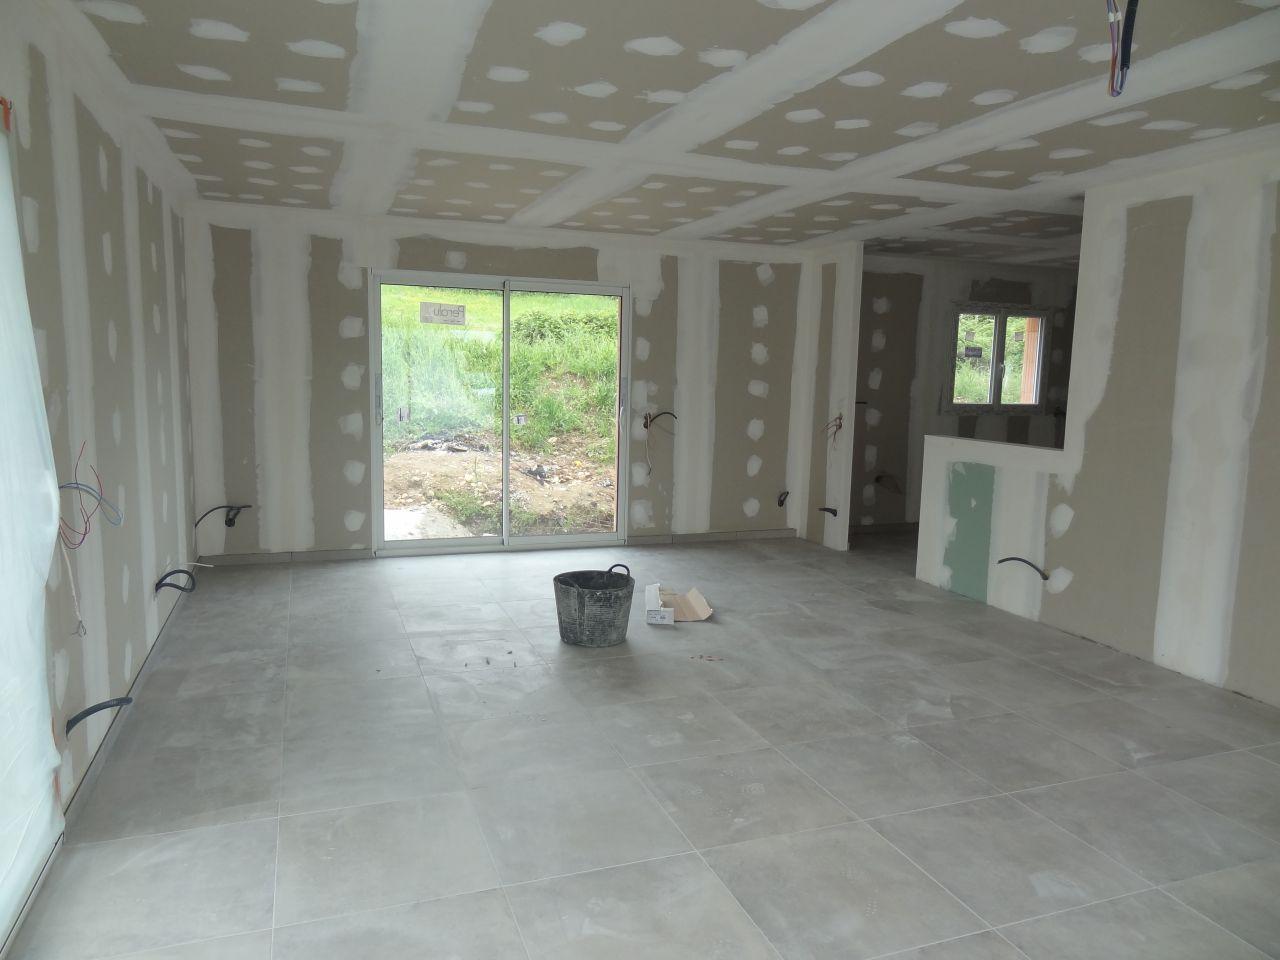 Carrelage grand carreaux maison design for Grand carreau carrelage